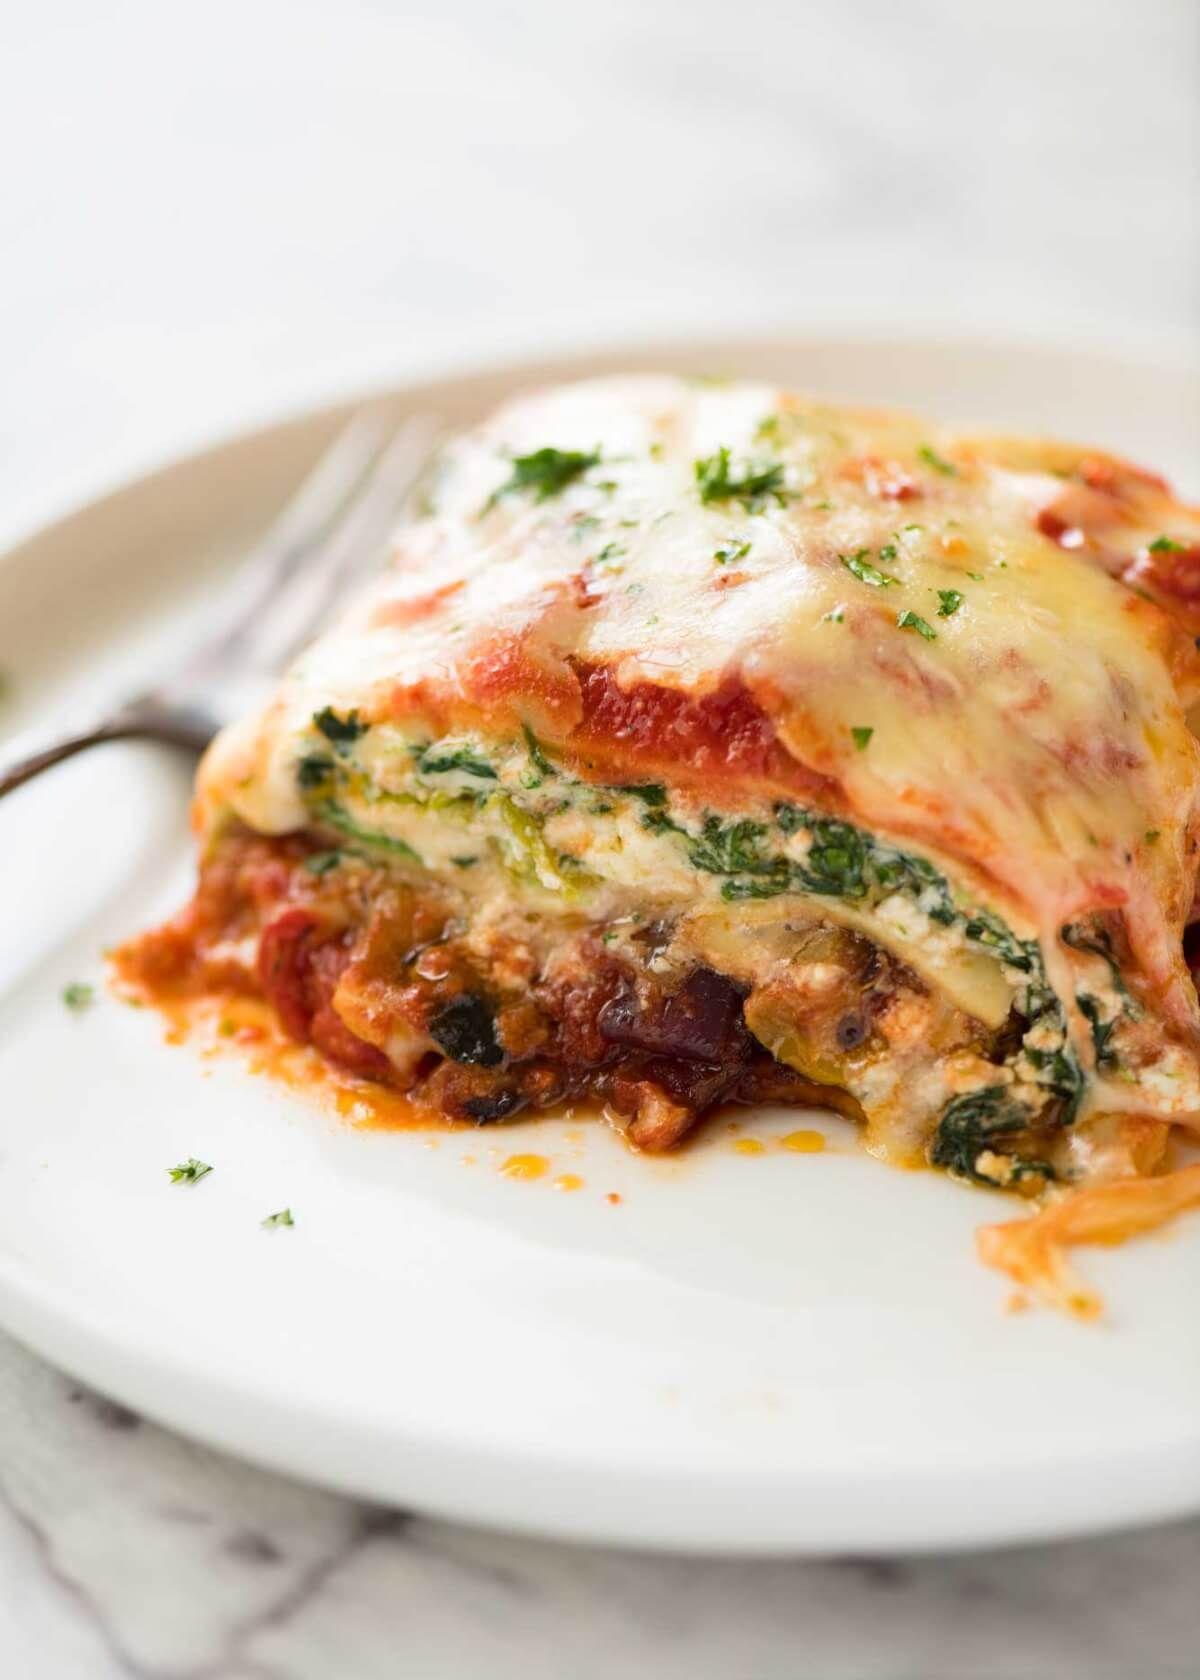 Vegetarian Lasagna Recipe Vegetarian Lasagna Recipe Vegetarian Lasagna Vegetable Lasagna Recipes